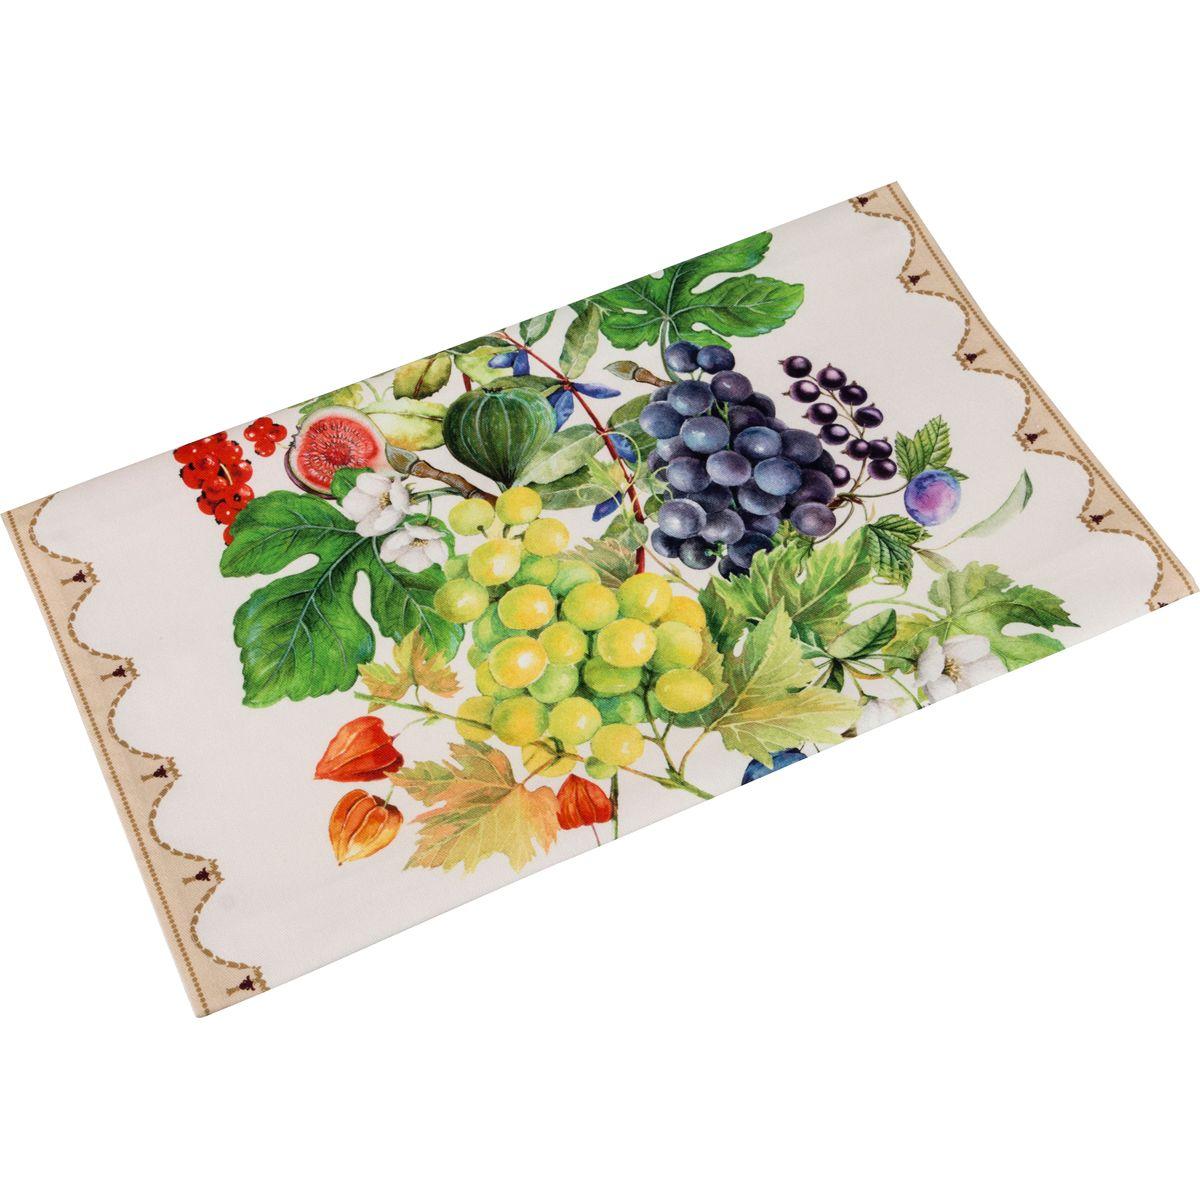 Полотенца Santalino, Кухонное полотенце Натюрморт Цвет: Бежевый (40х70 см), Россия, Махра  - Купить